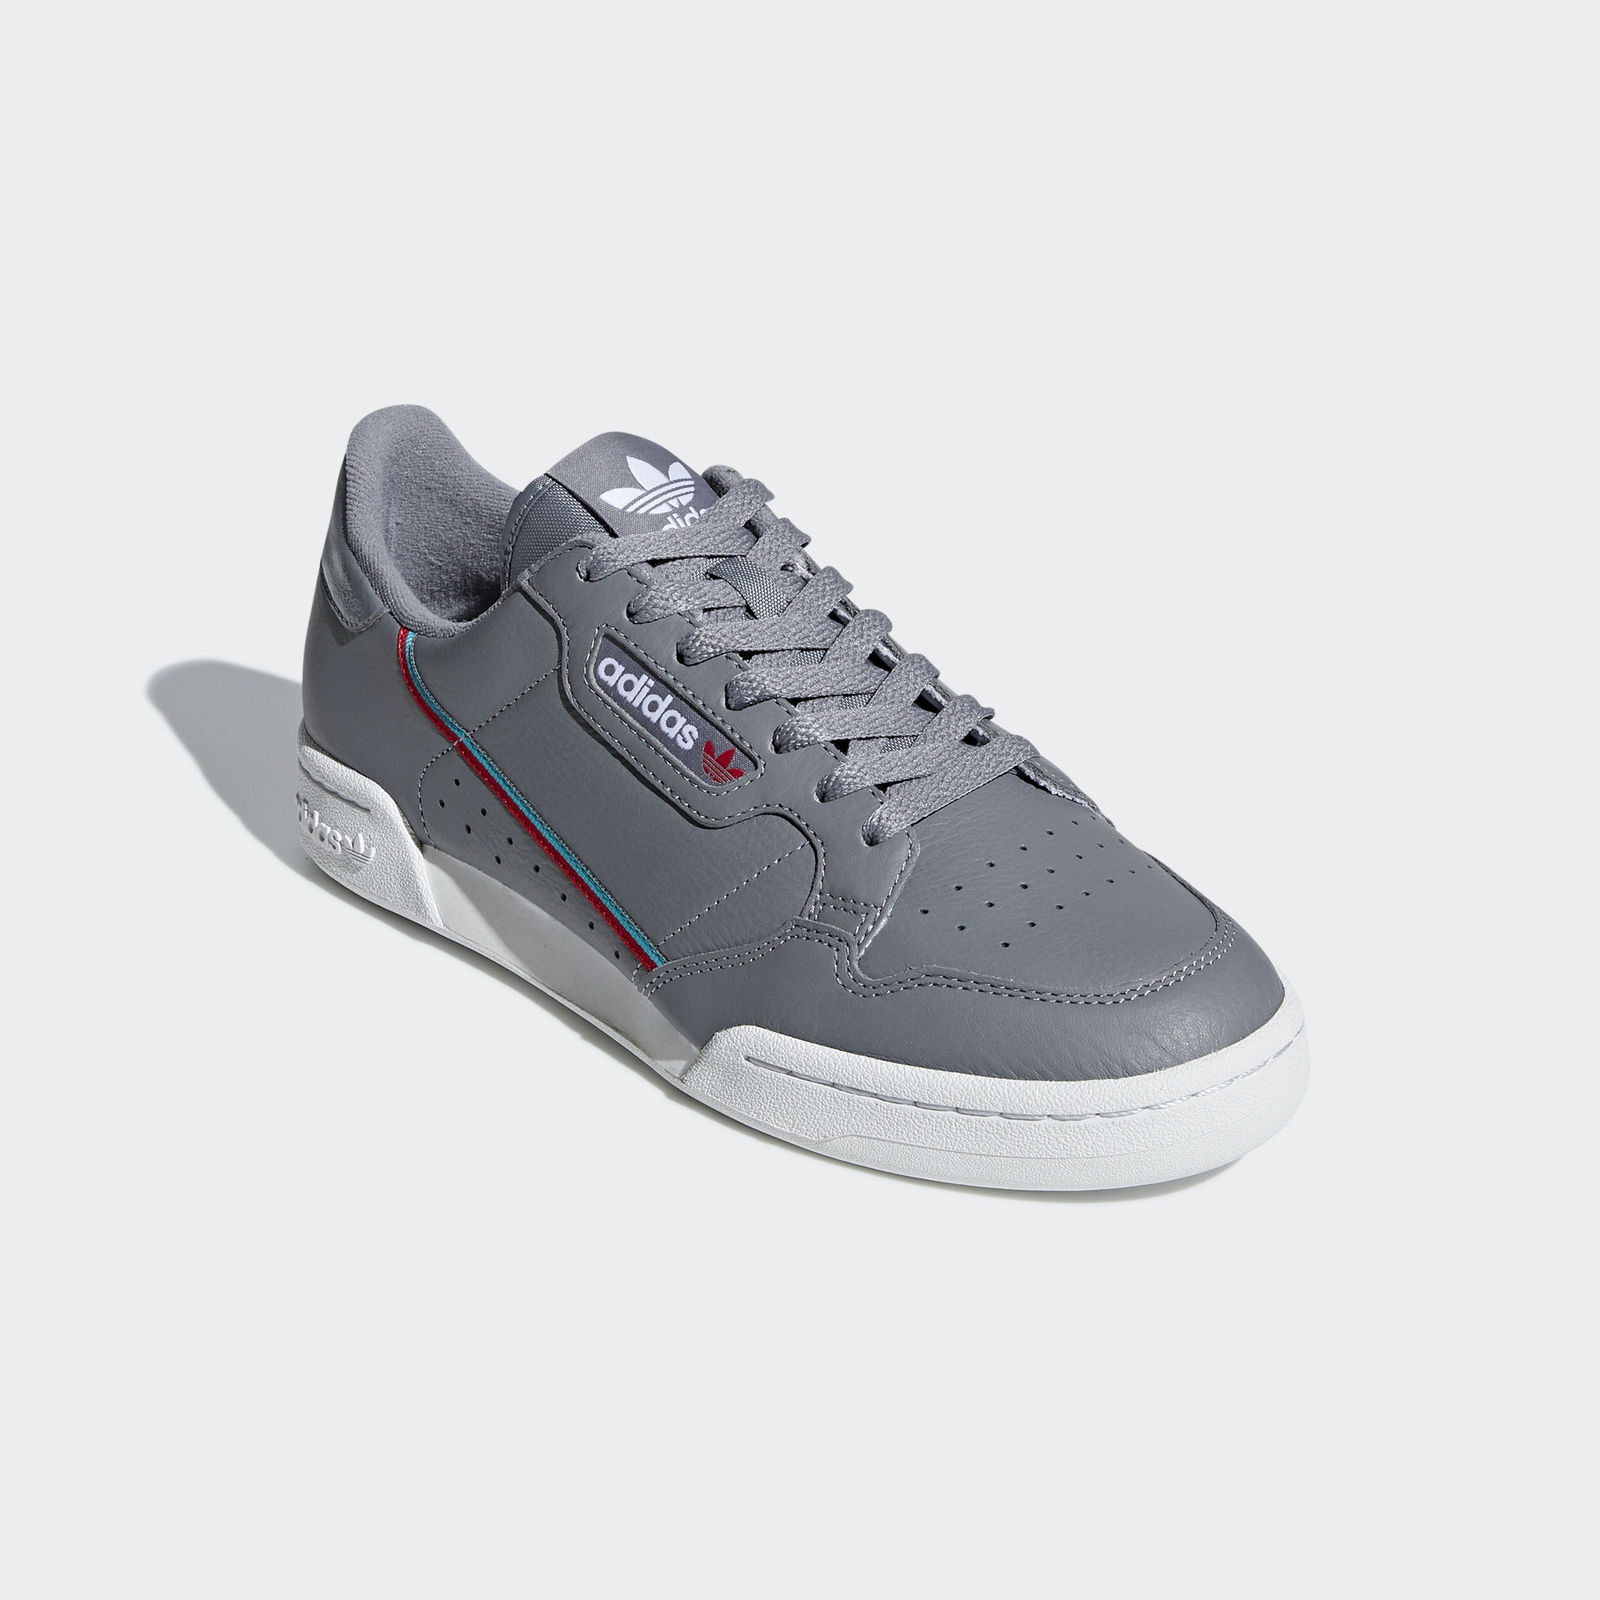 adidas Originals Continental 80 Herren Schuh Trainers grau